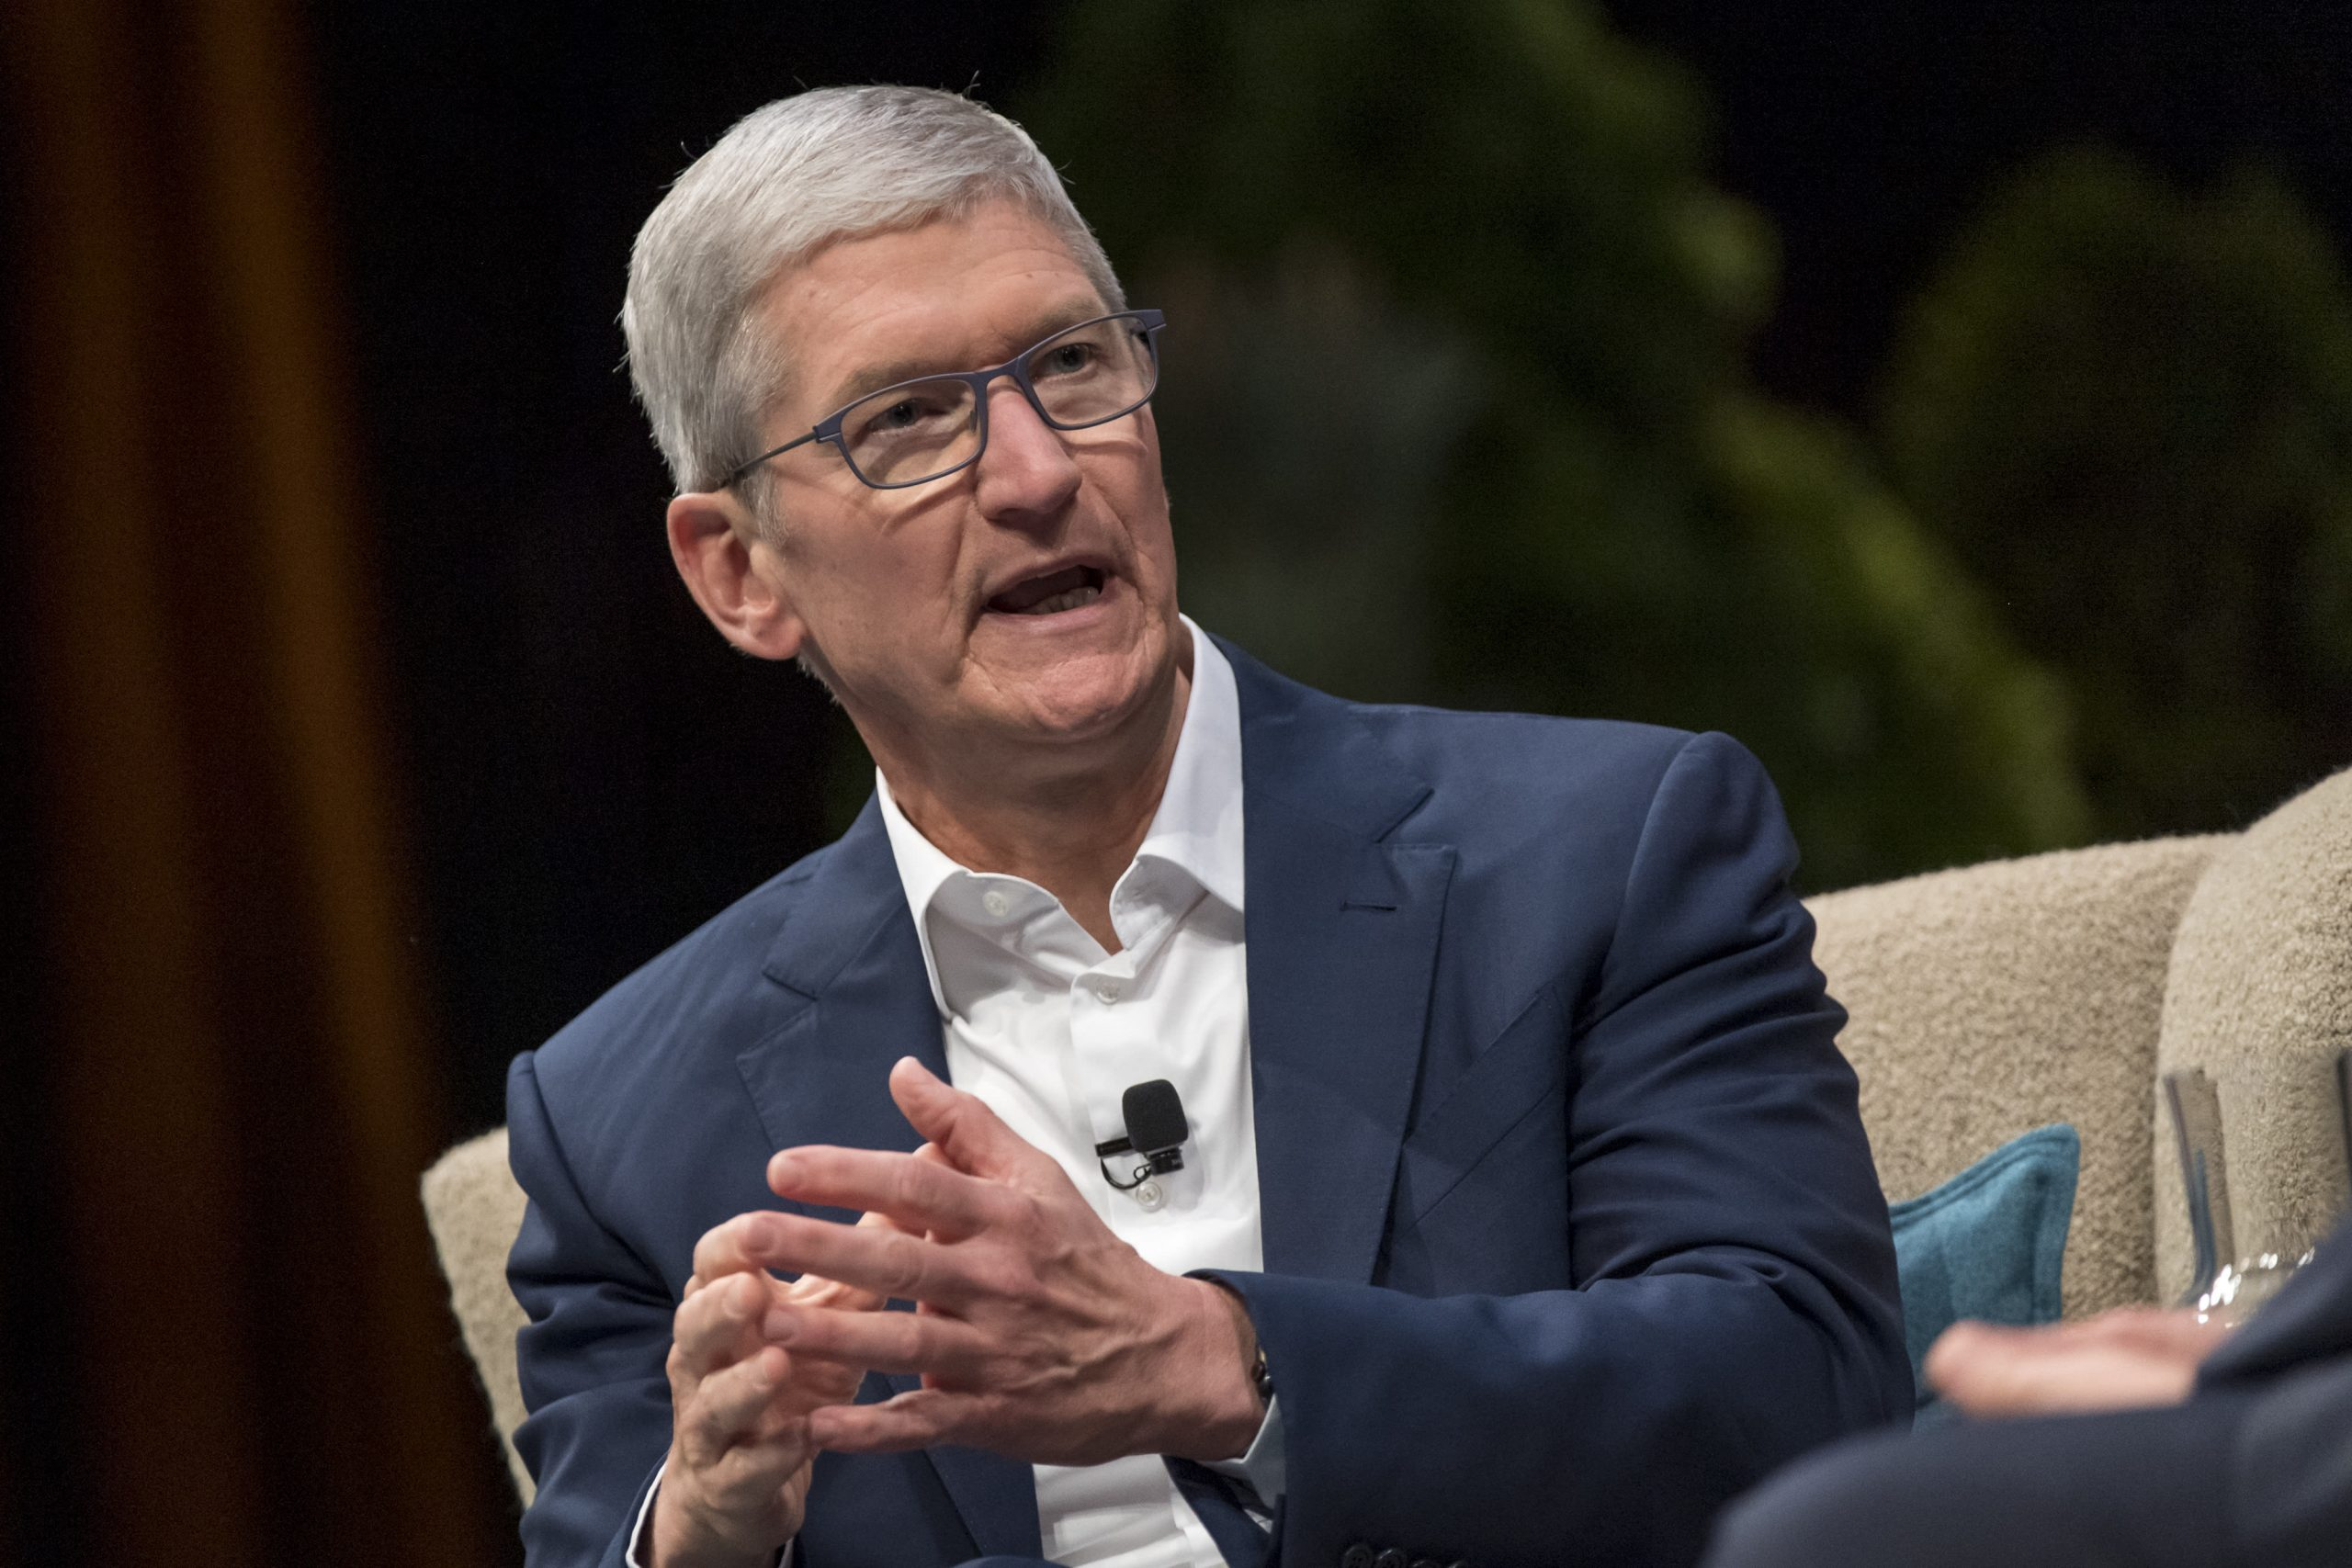 Apple, Google, Amazon and Facebook CEOs to testify in Congress